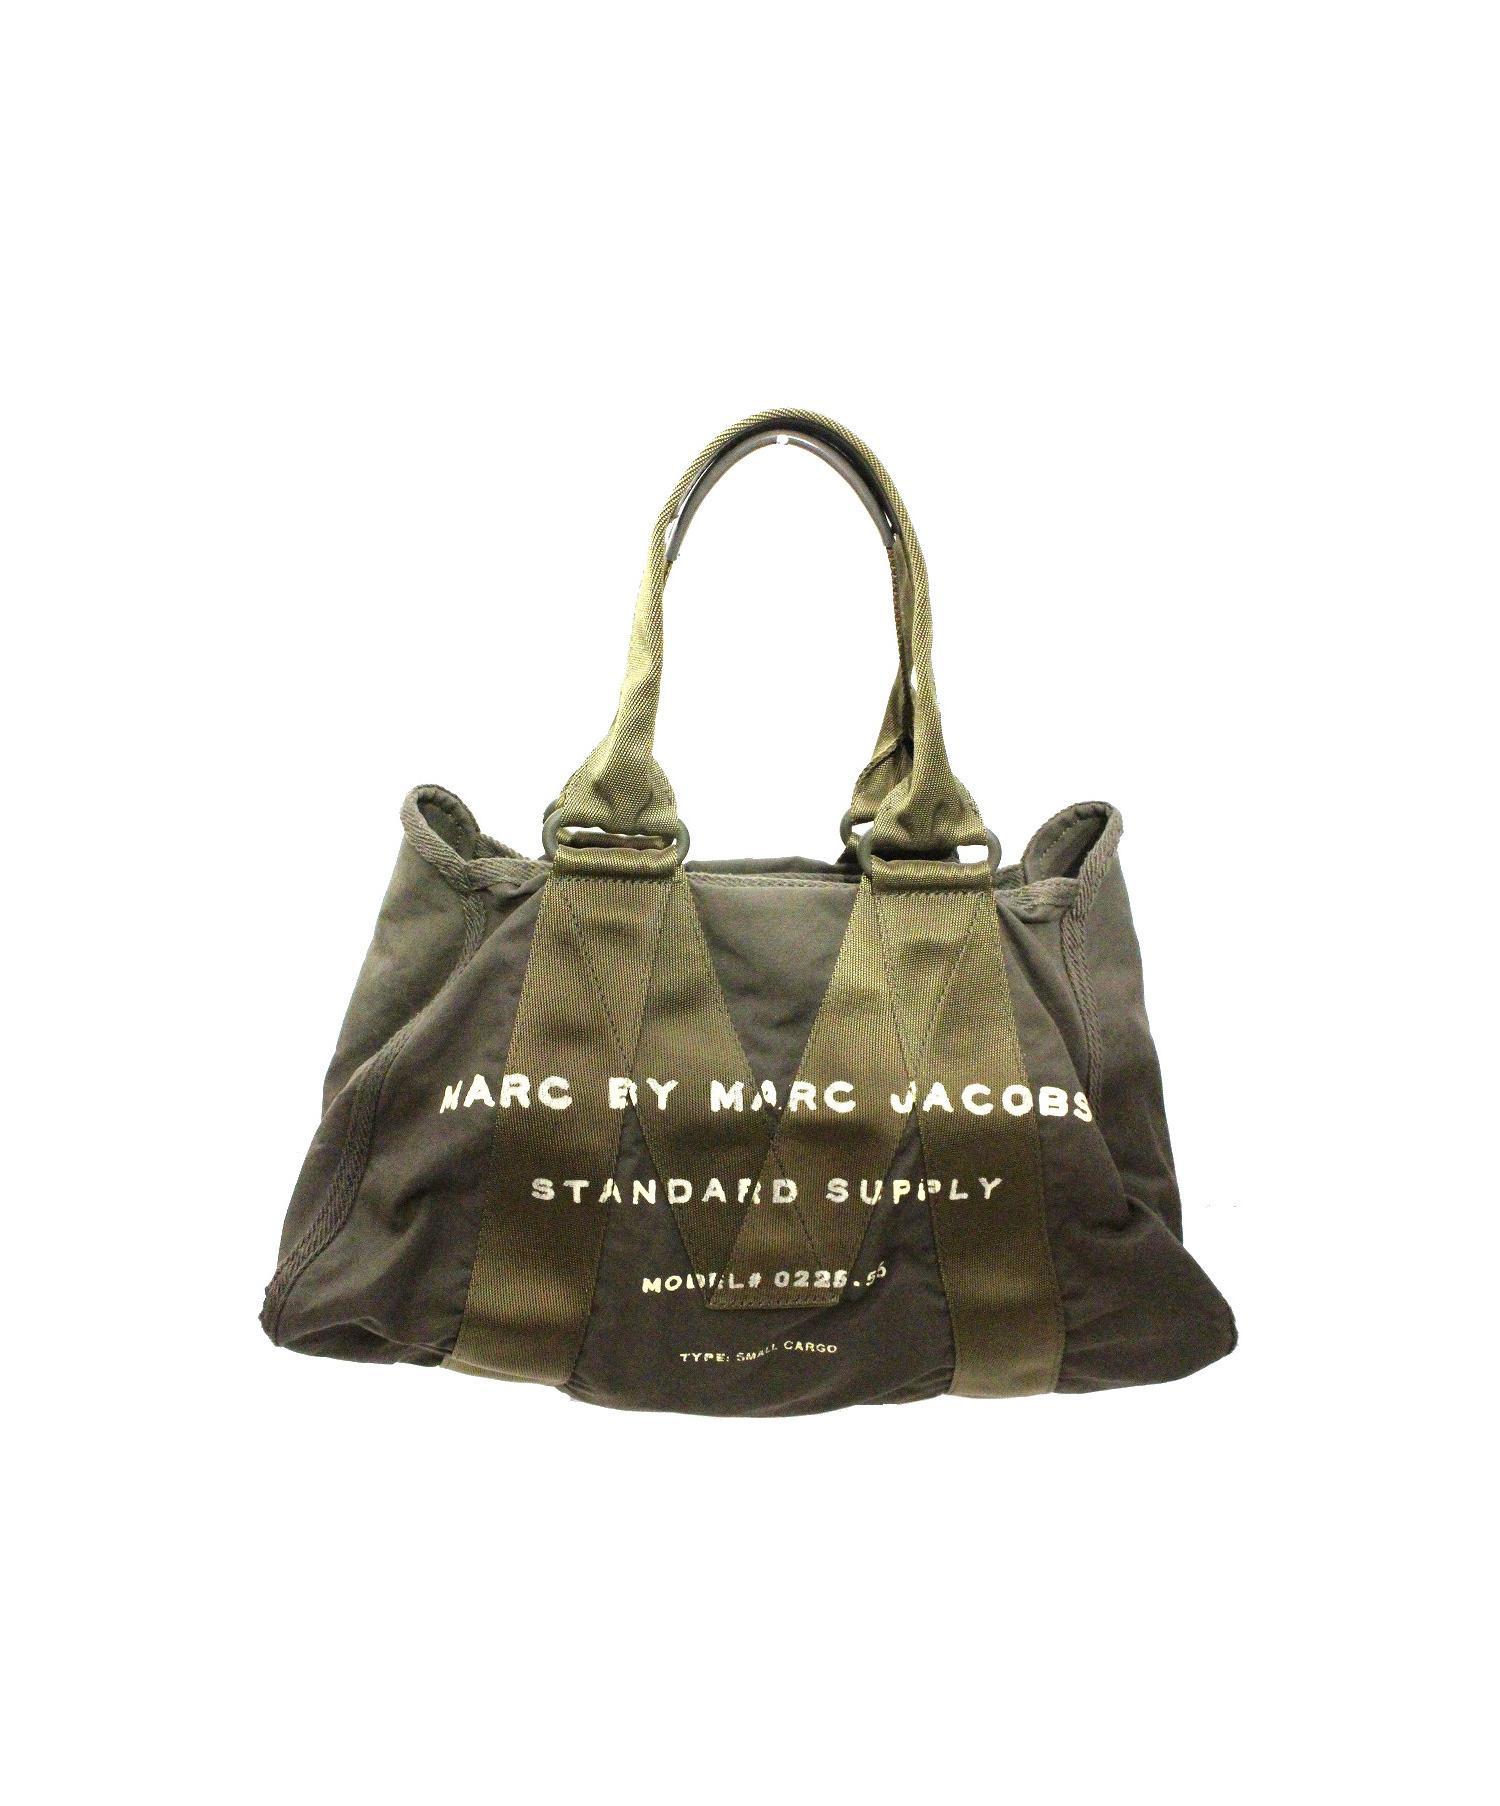 35e2e28aea41e Marc by Marc Jacobs (マークバイマークジェイコブス) トートバッグ サイズ:下記参照 STANDARD SUPPLY  M303060 参考定価¥24.000+税 SMALL CARGO